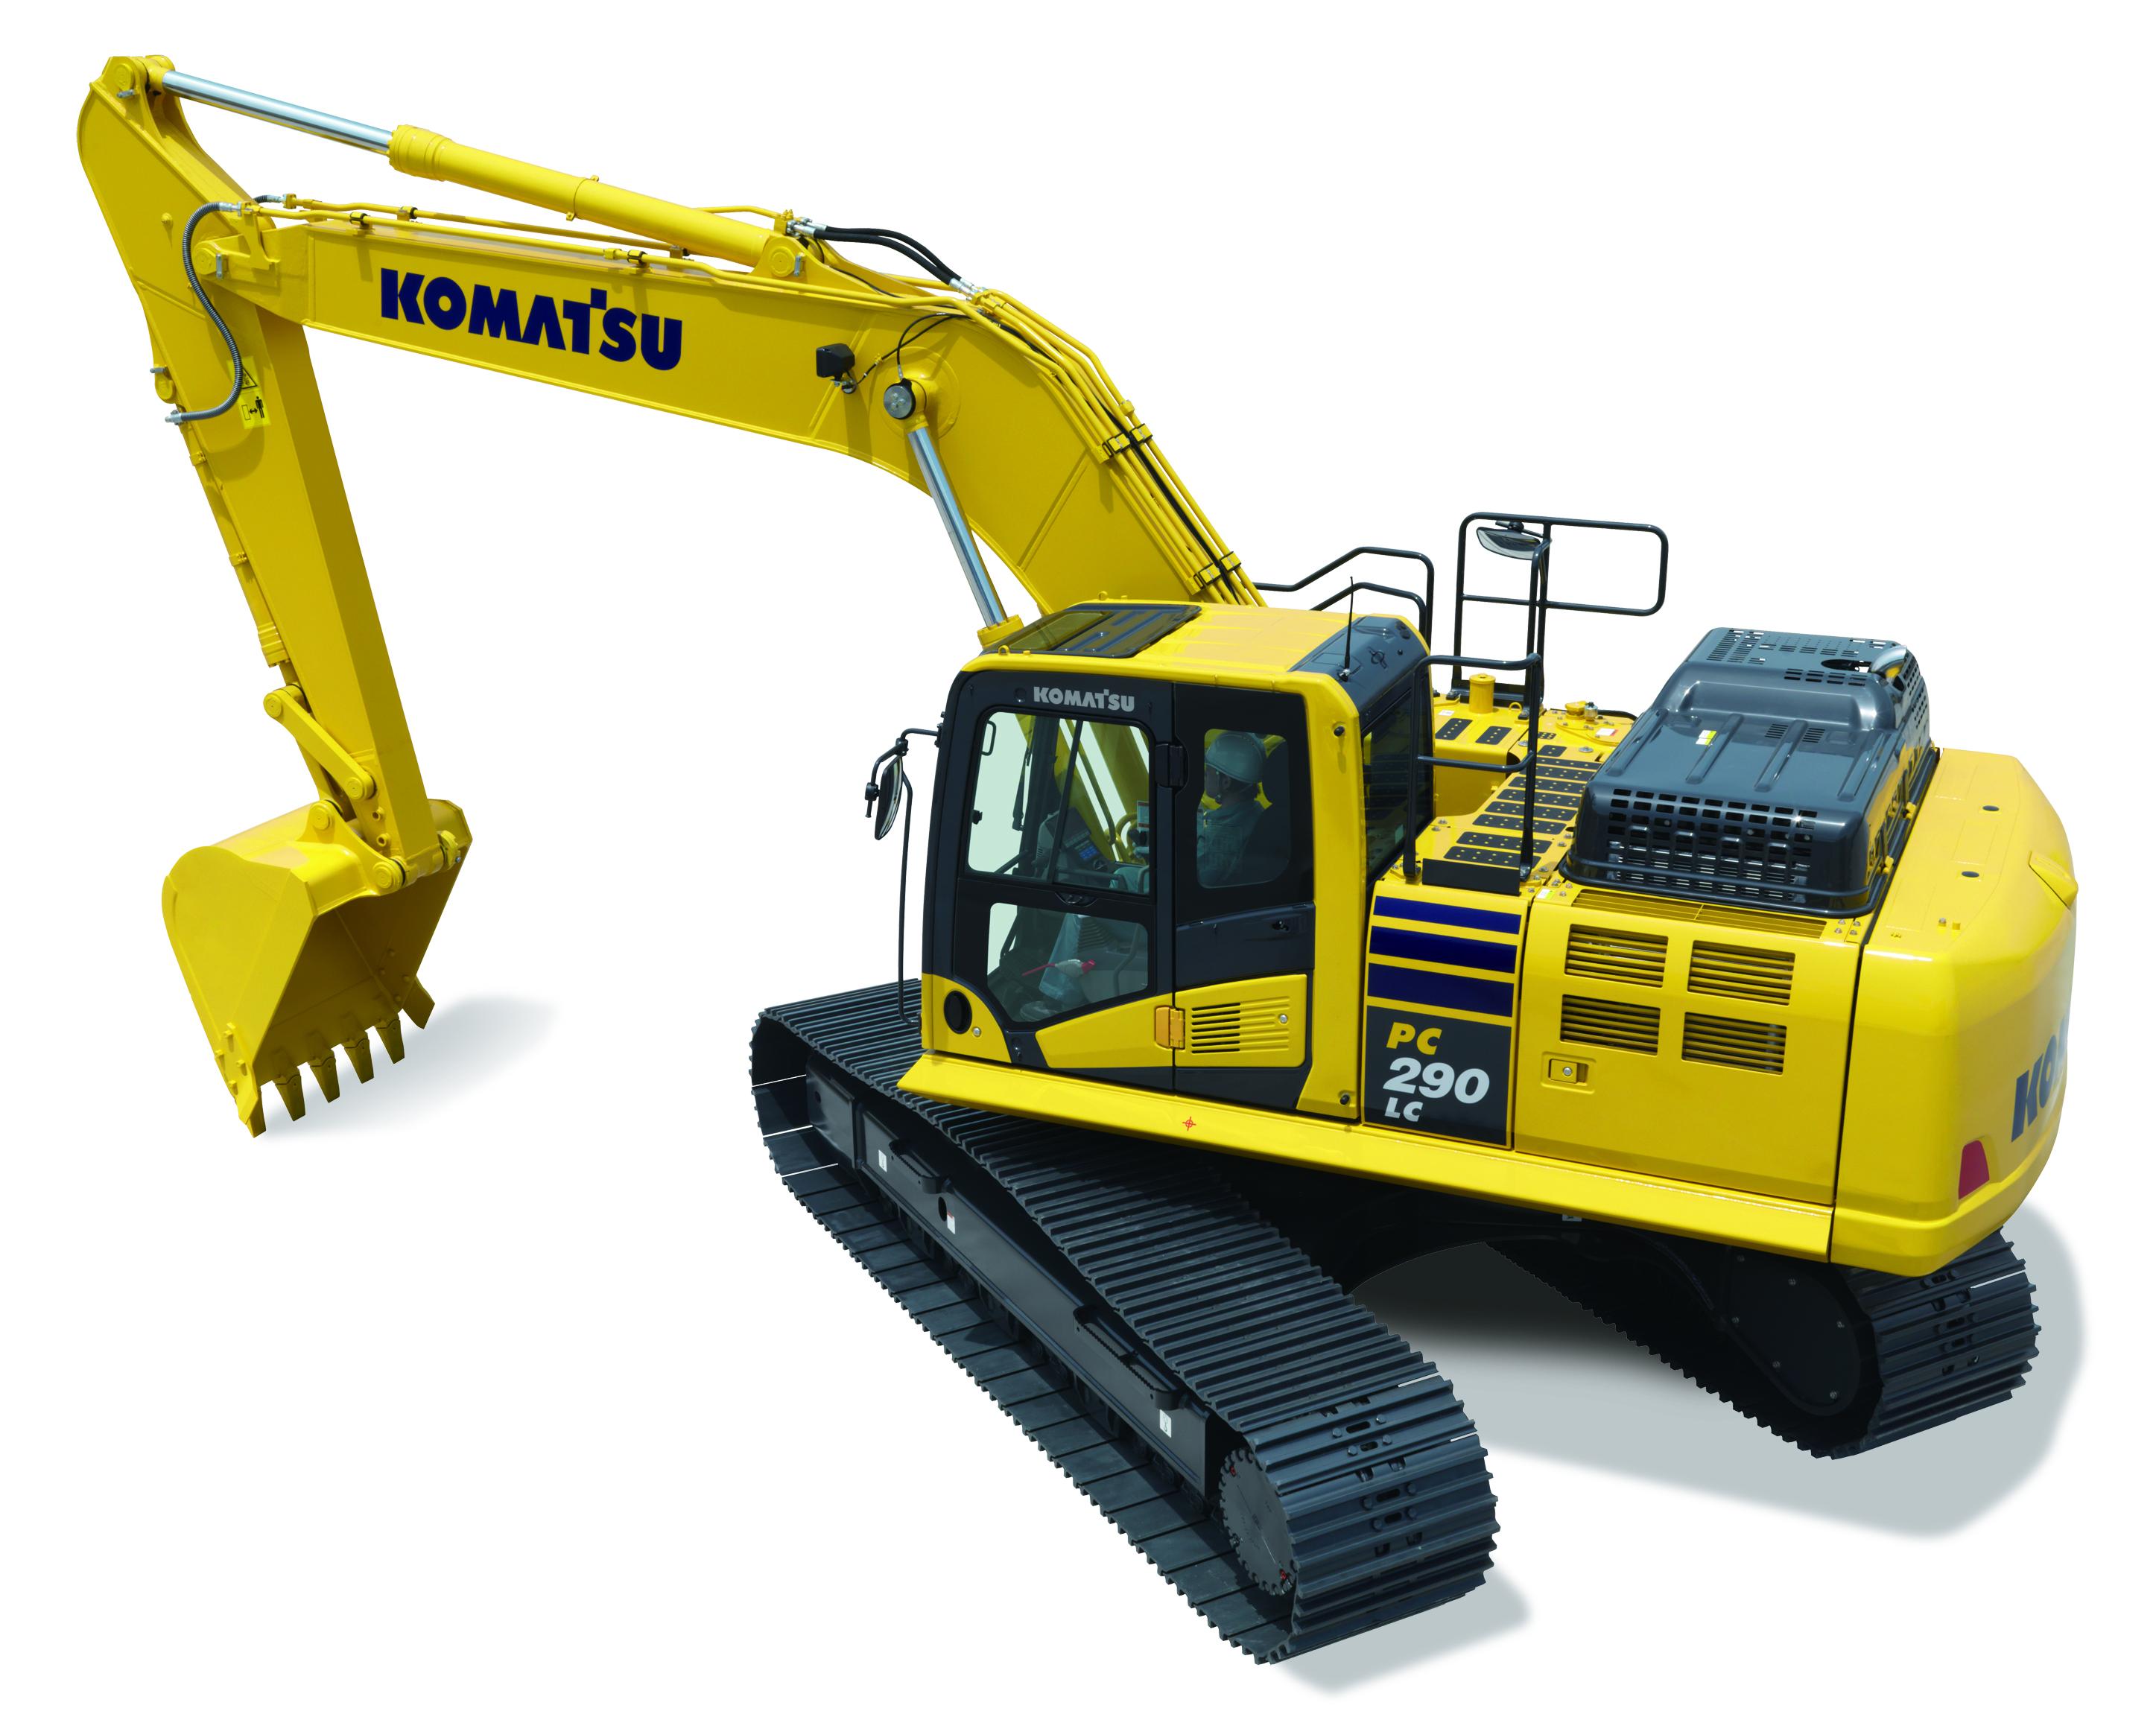 Komatsu expands semi-auto excavator lineup with new PC290LCi-11